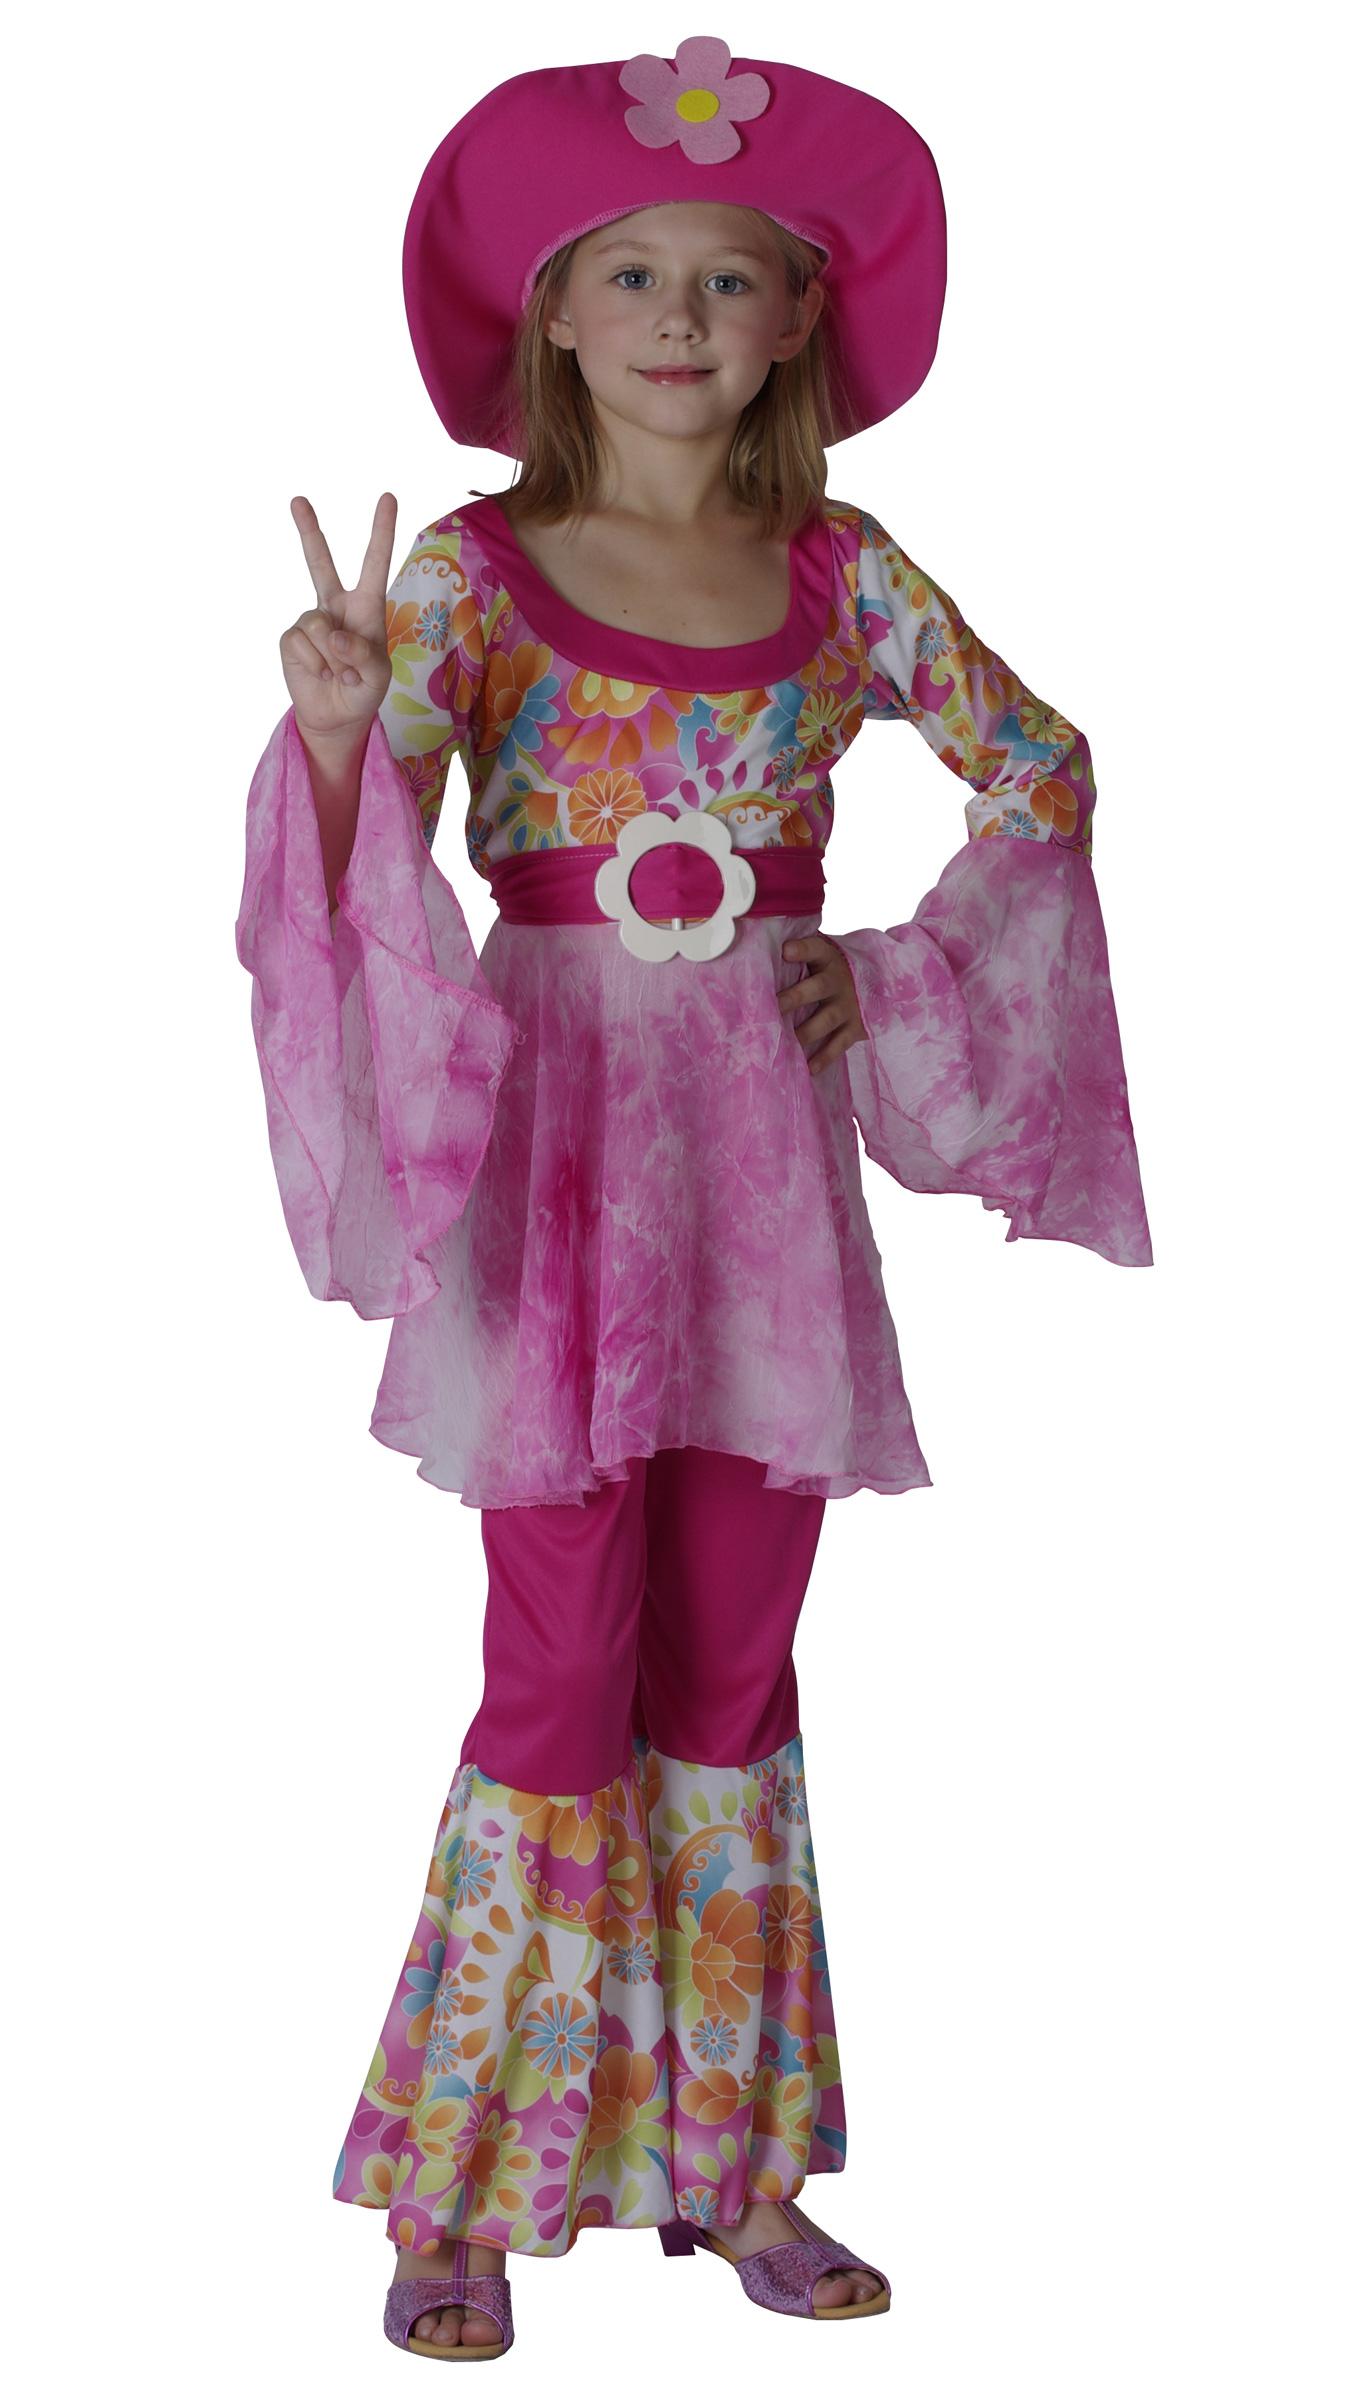 d guisement hippie fille d guisement baba cool enfant costume carnaval. Black Bedroom Furniture Sets. Home Design Ideas